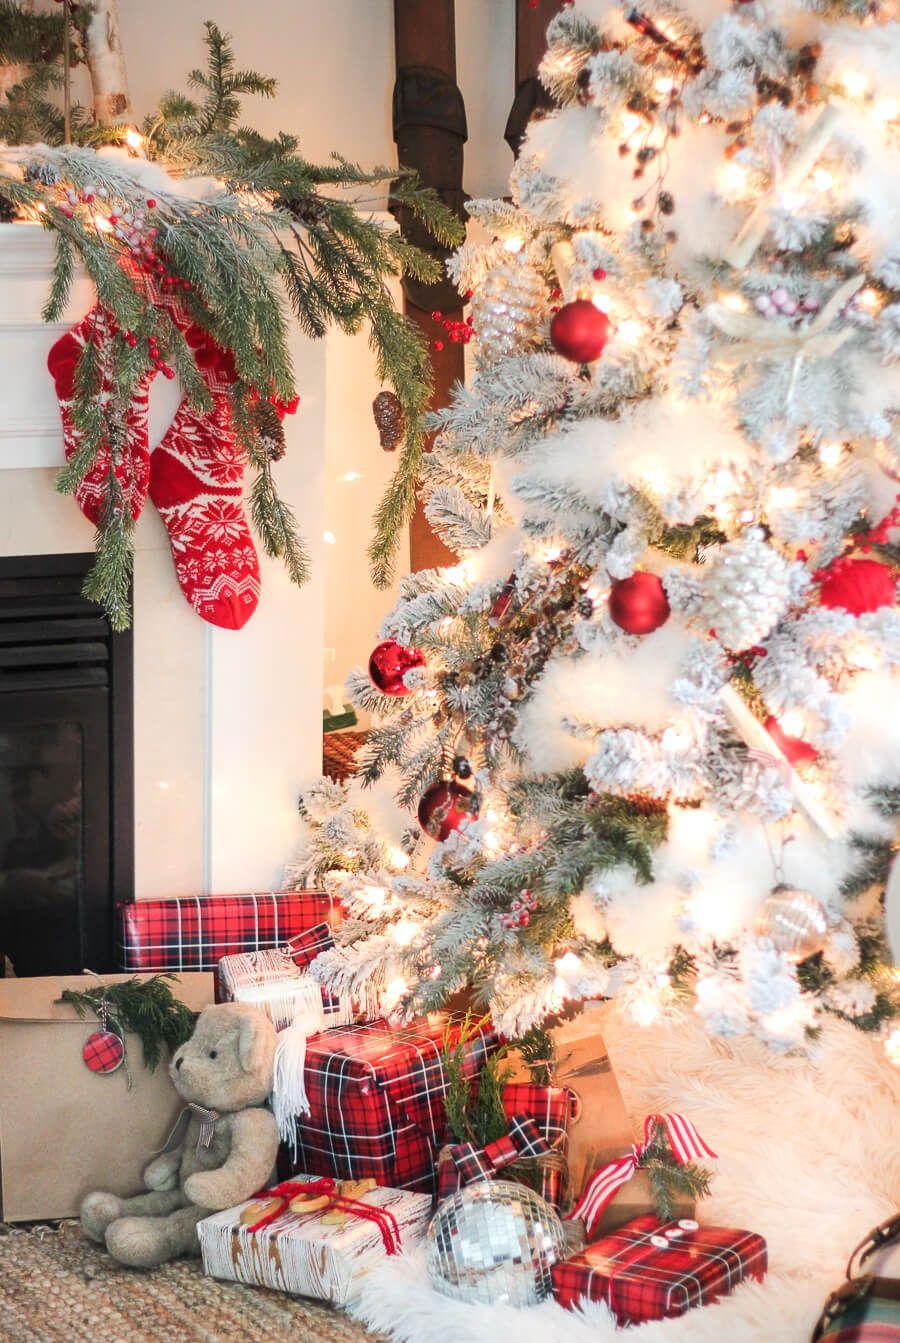 Albero Natale Decorato Rosso 40+ red christmas decor ideas to get everyone into the